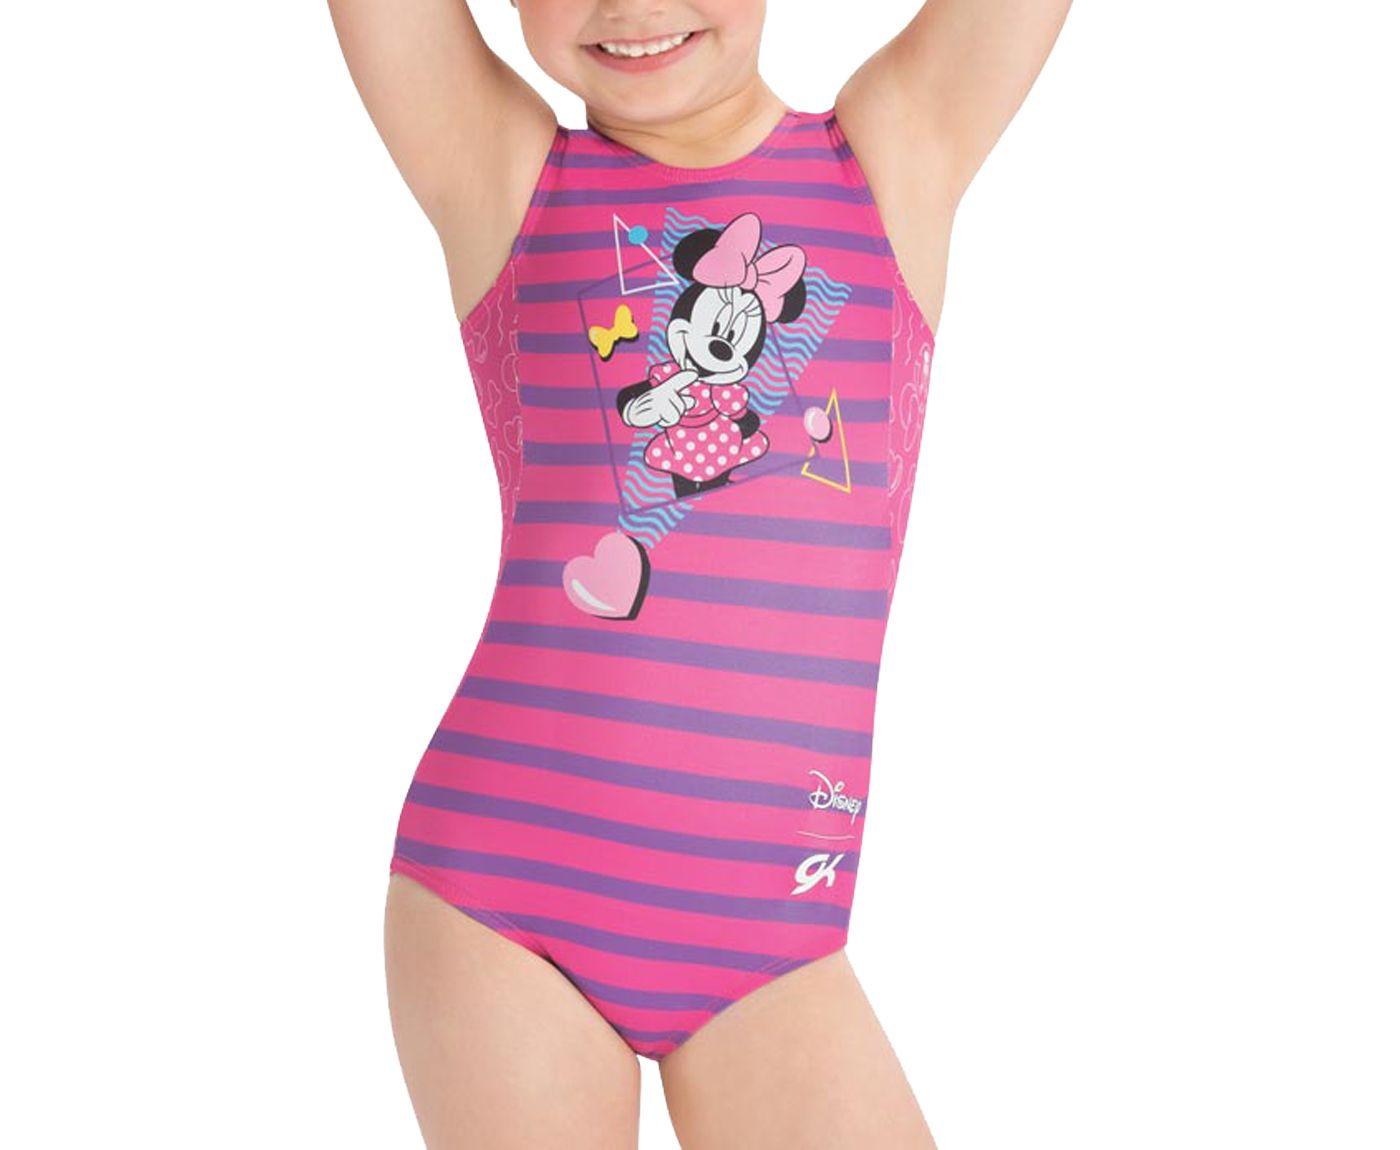 GK Elite Youth Disney Minnie Mouse Retro Gymnastics Leotard